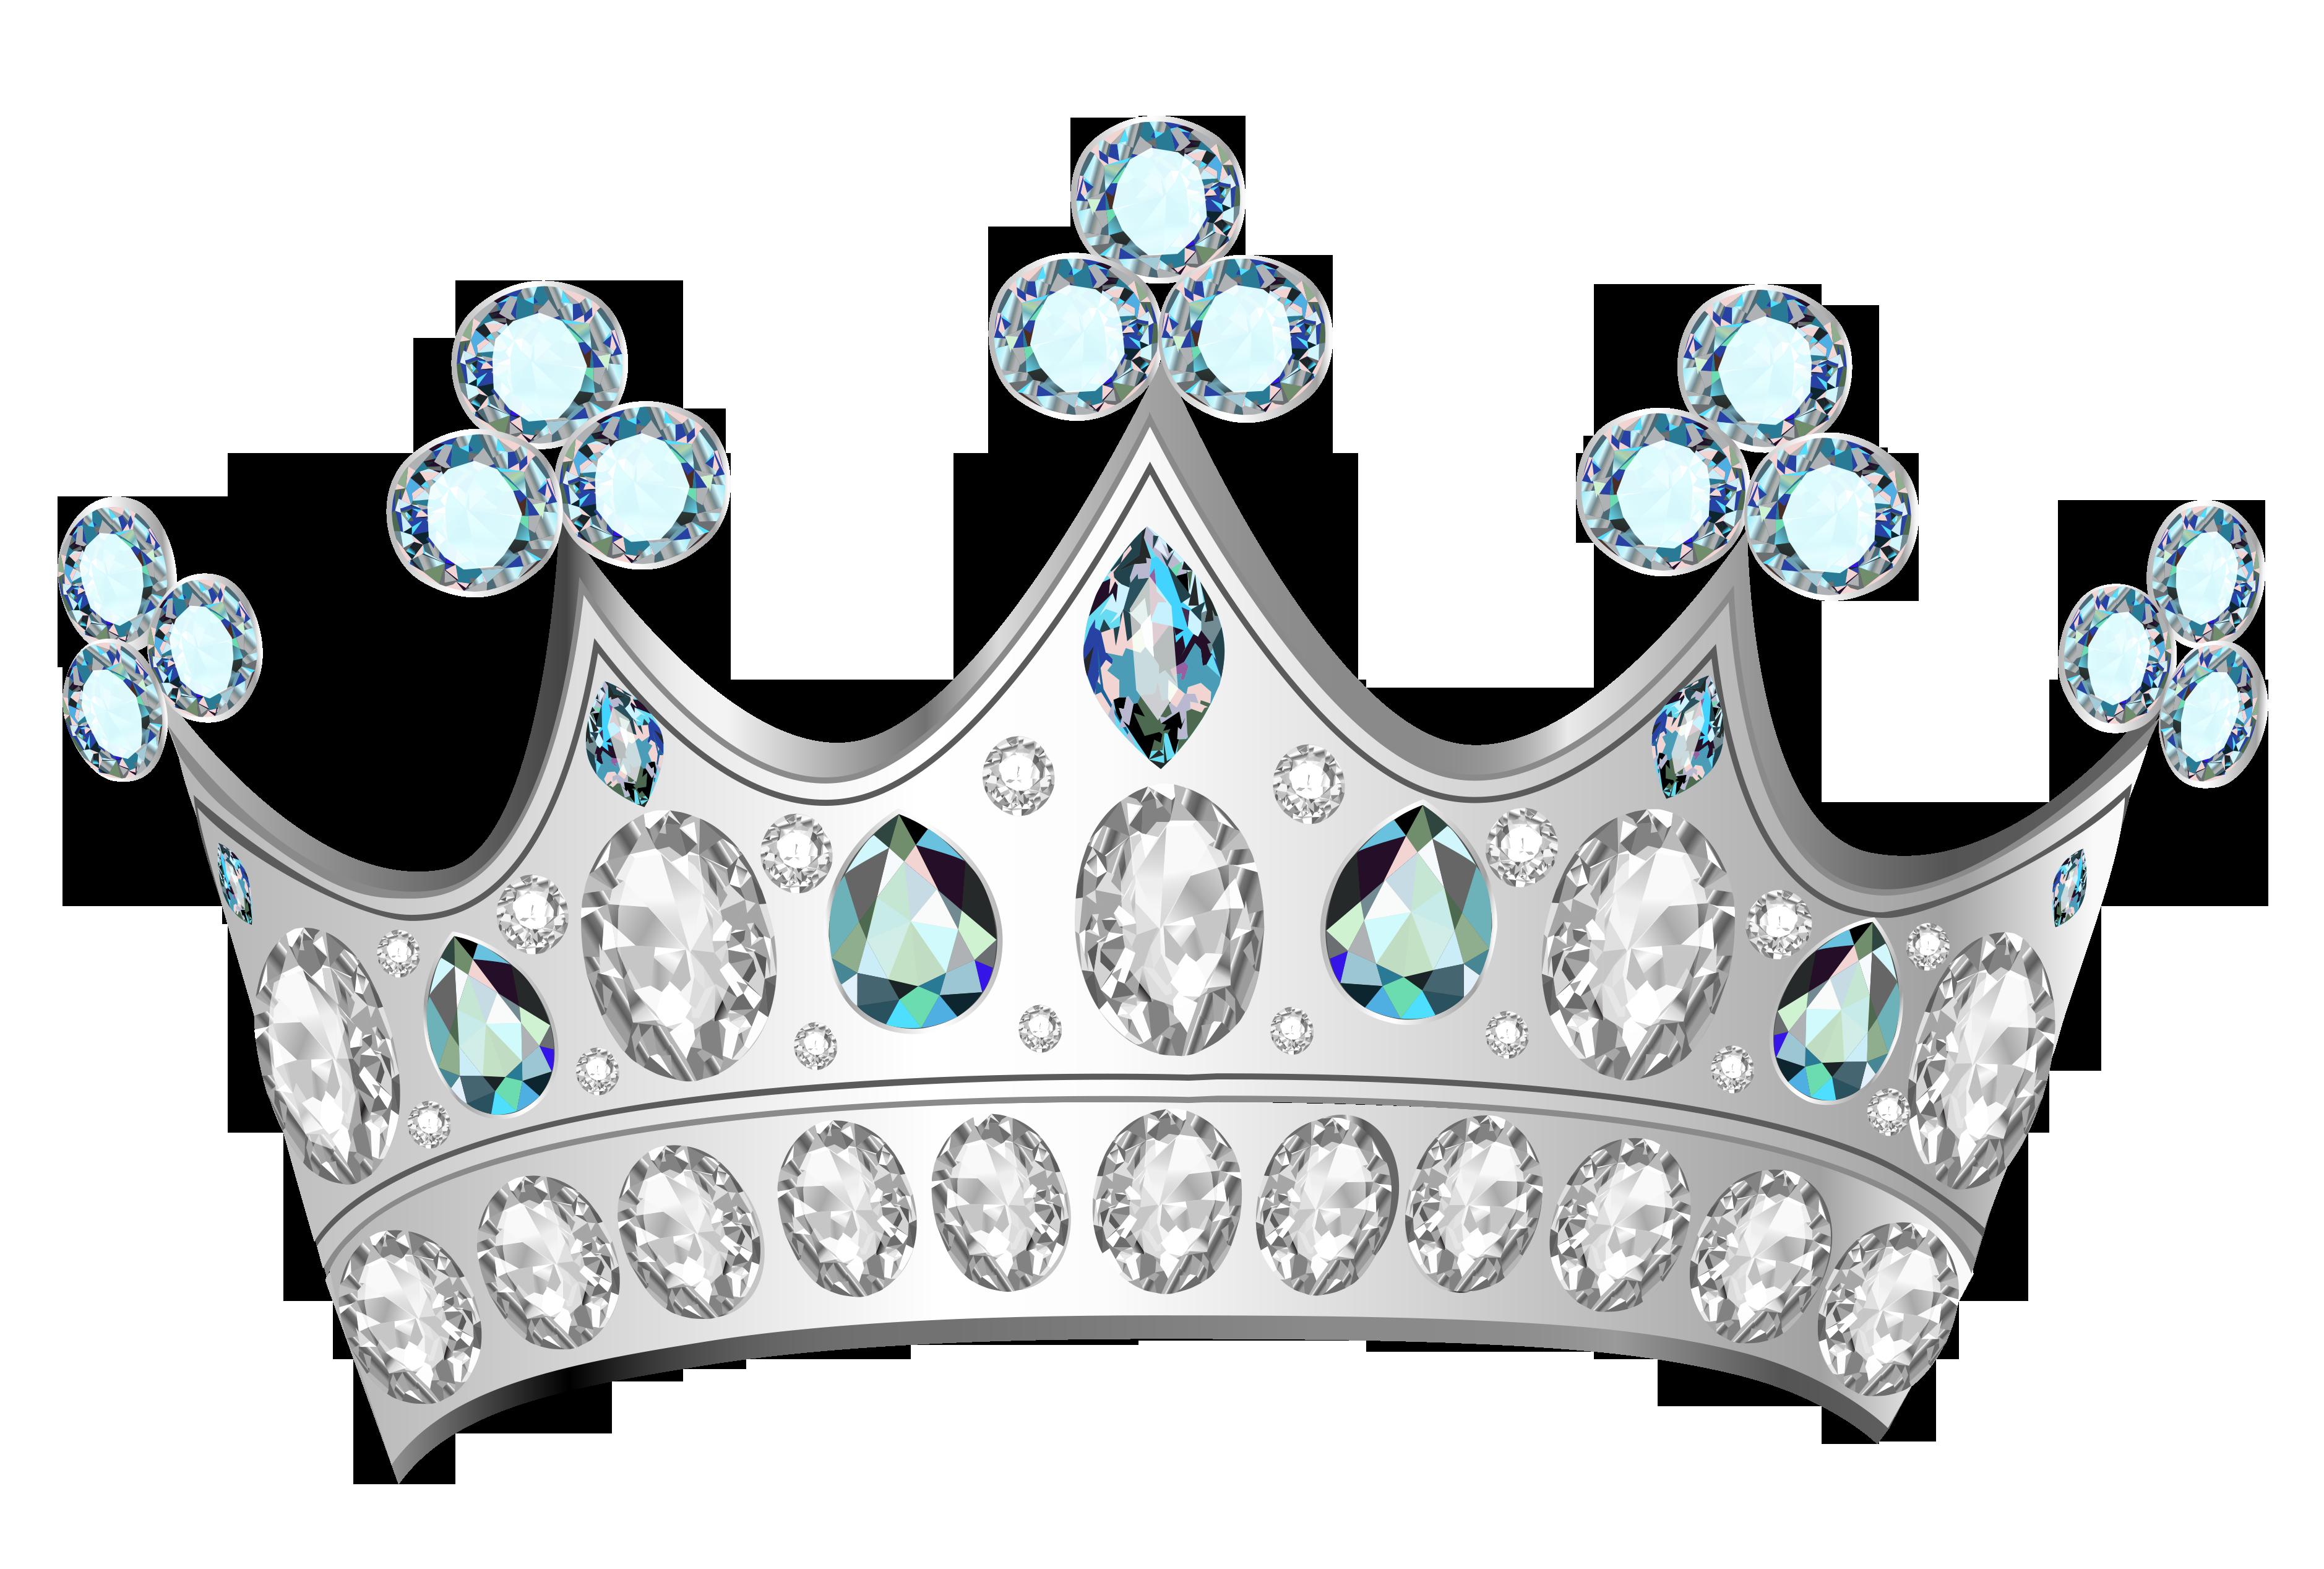 svg royalty free library Diamonds jpg diamondscrownclipartjpg . 1 clipart crown